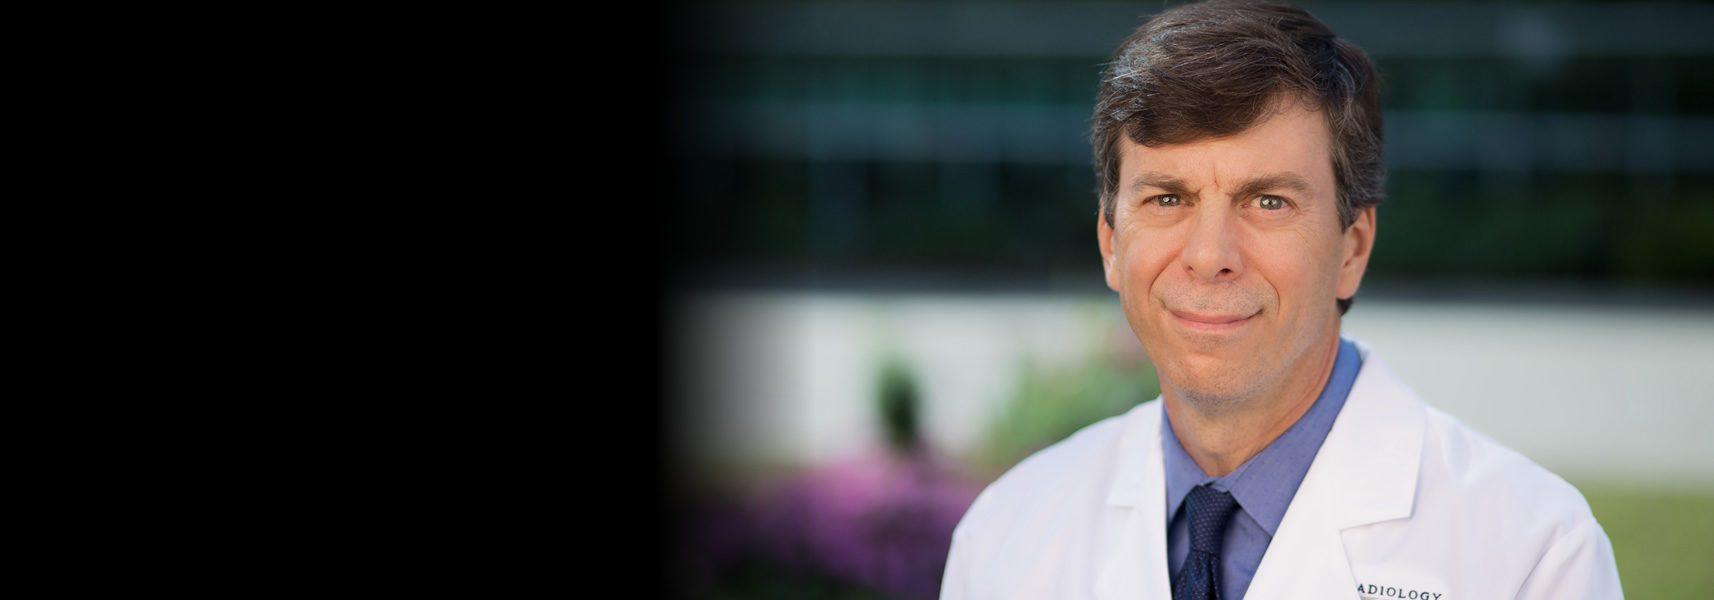 Kurt C  Luhmann, MD - Radiology Associates of Tallahassee